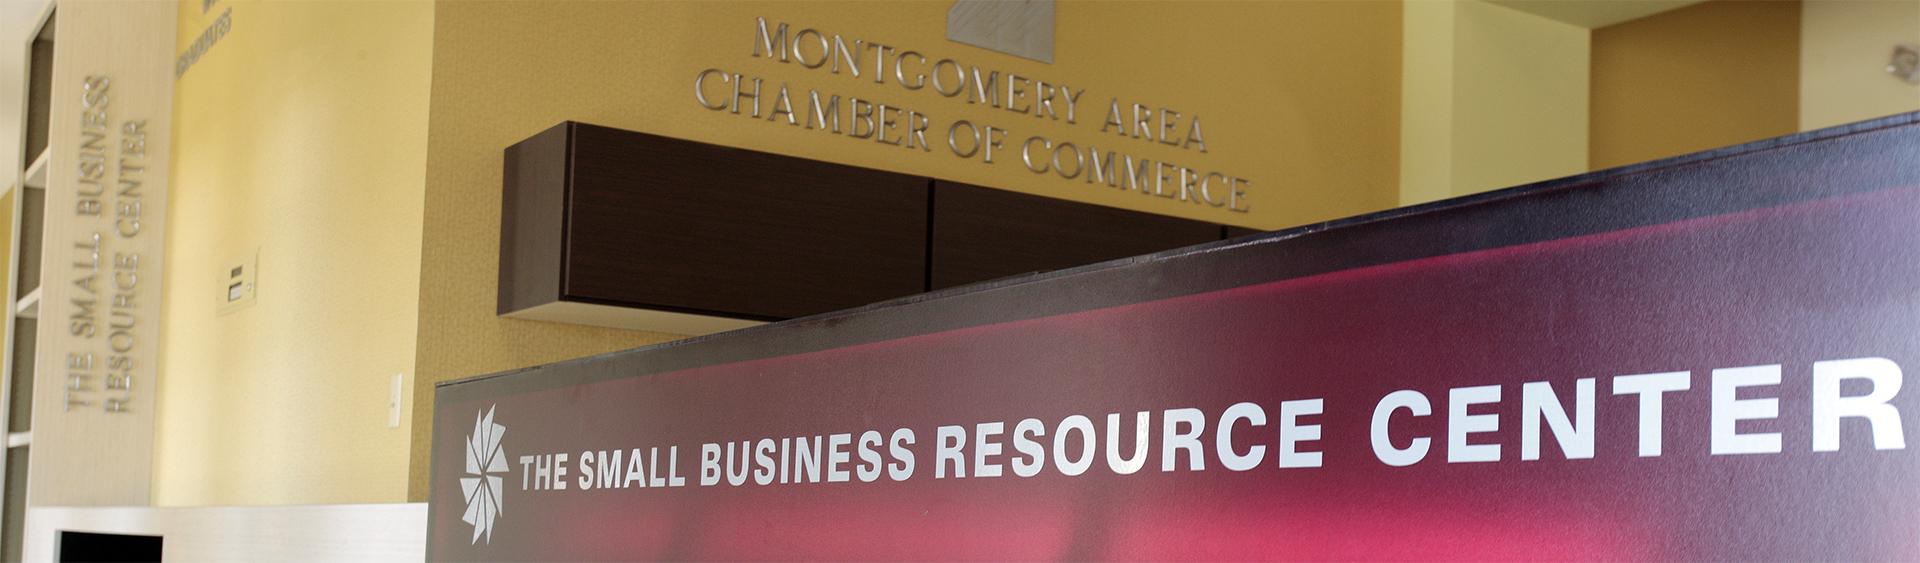 Small Business Resource Center, Montgomery Area Chamber of Commerce, Montgomery Chamber, MGMChamber, Montgomery Alabama